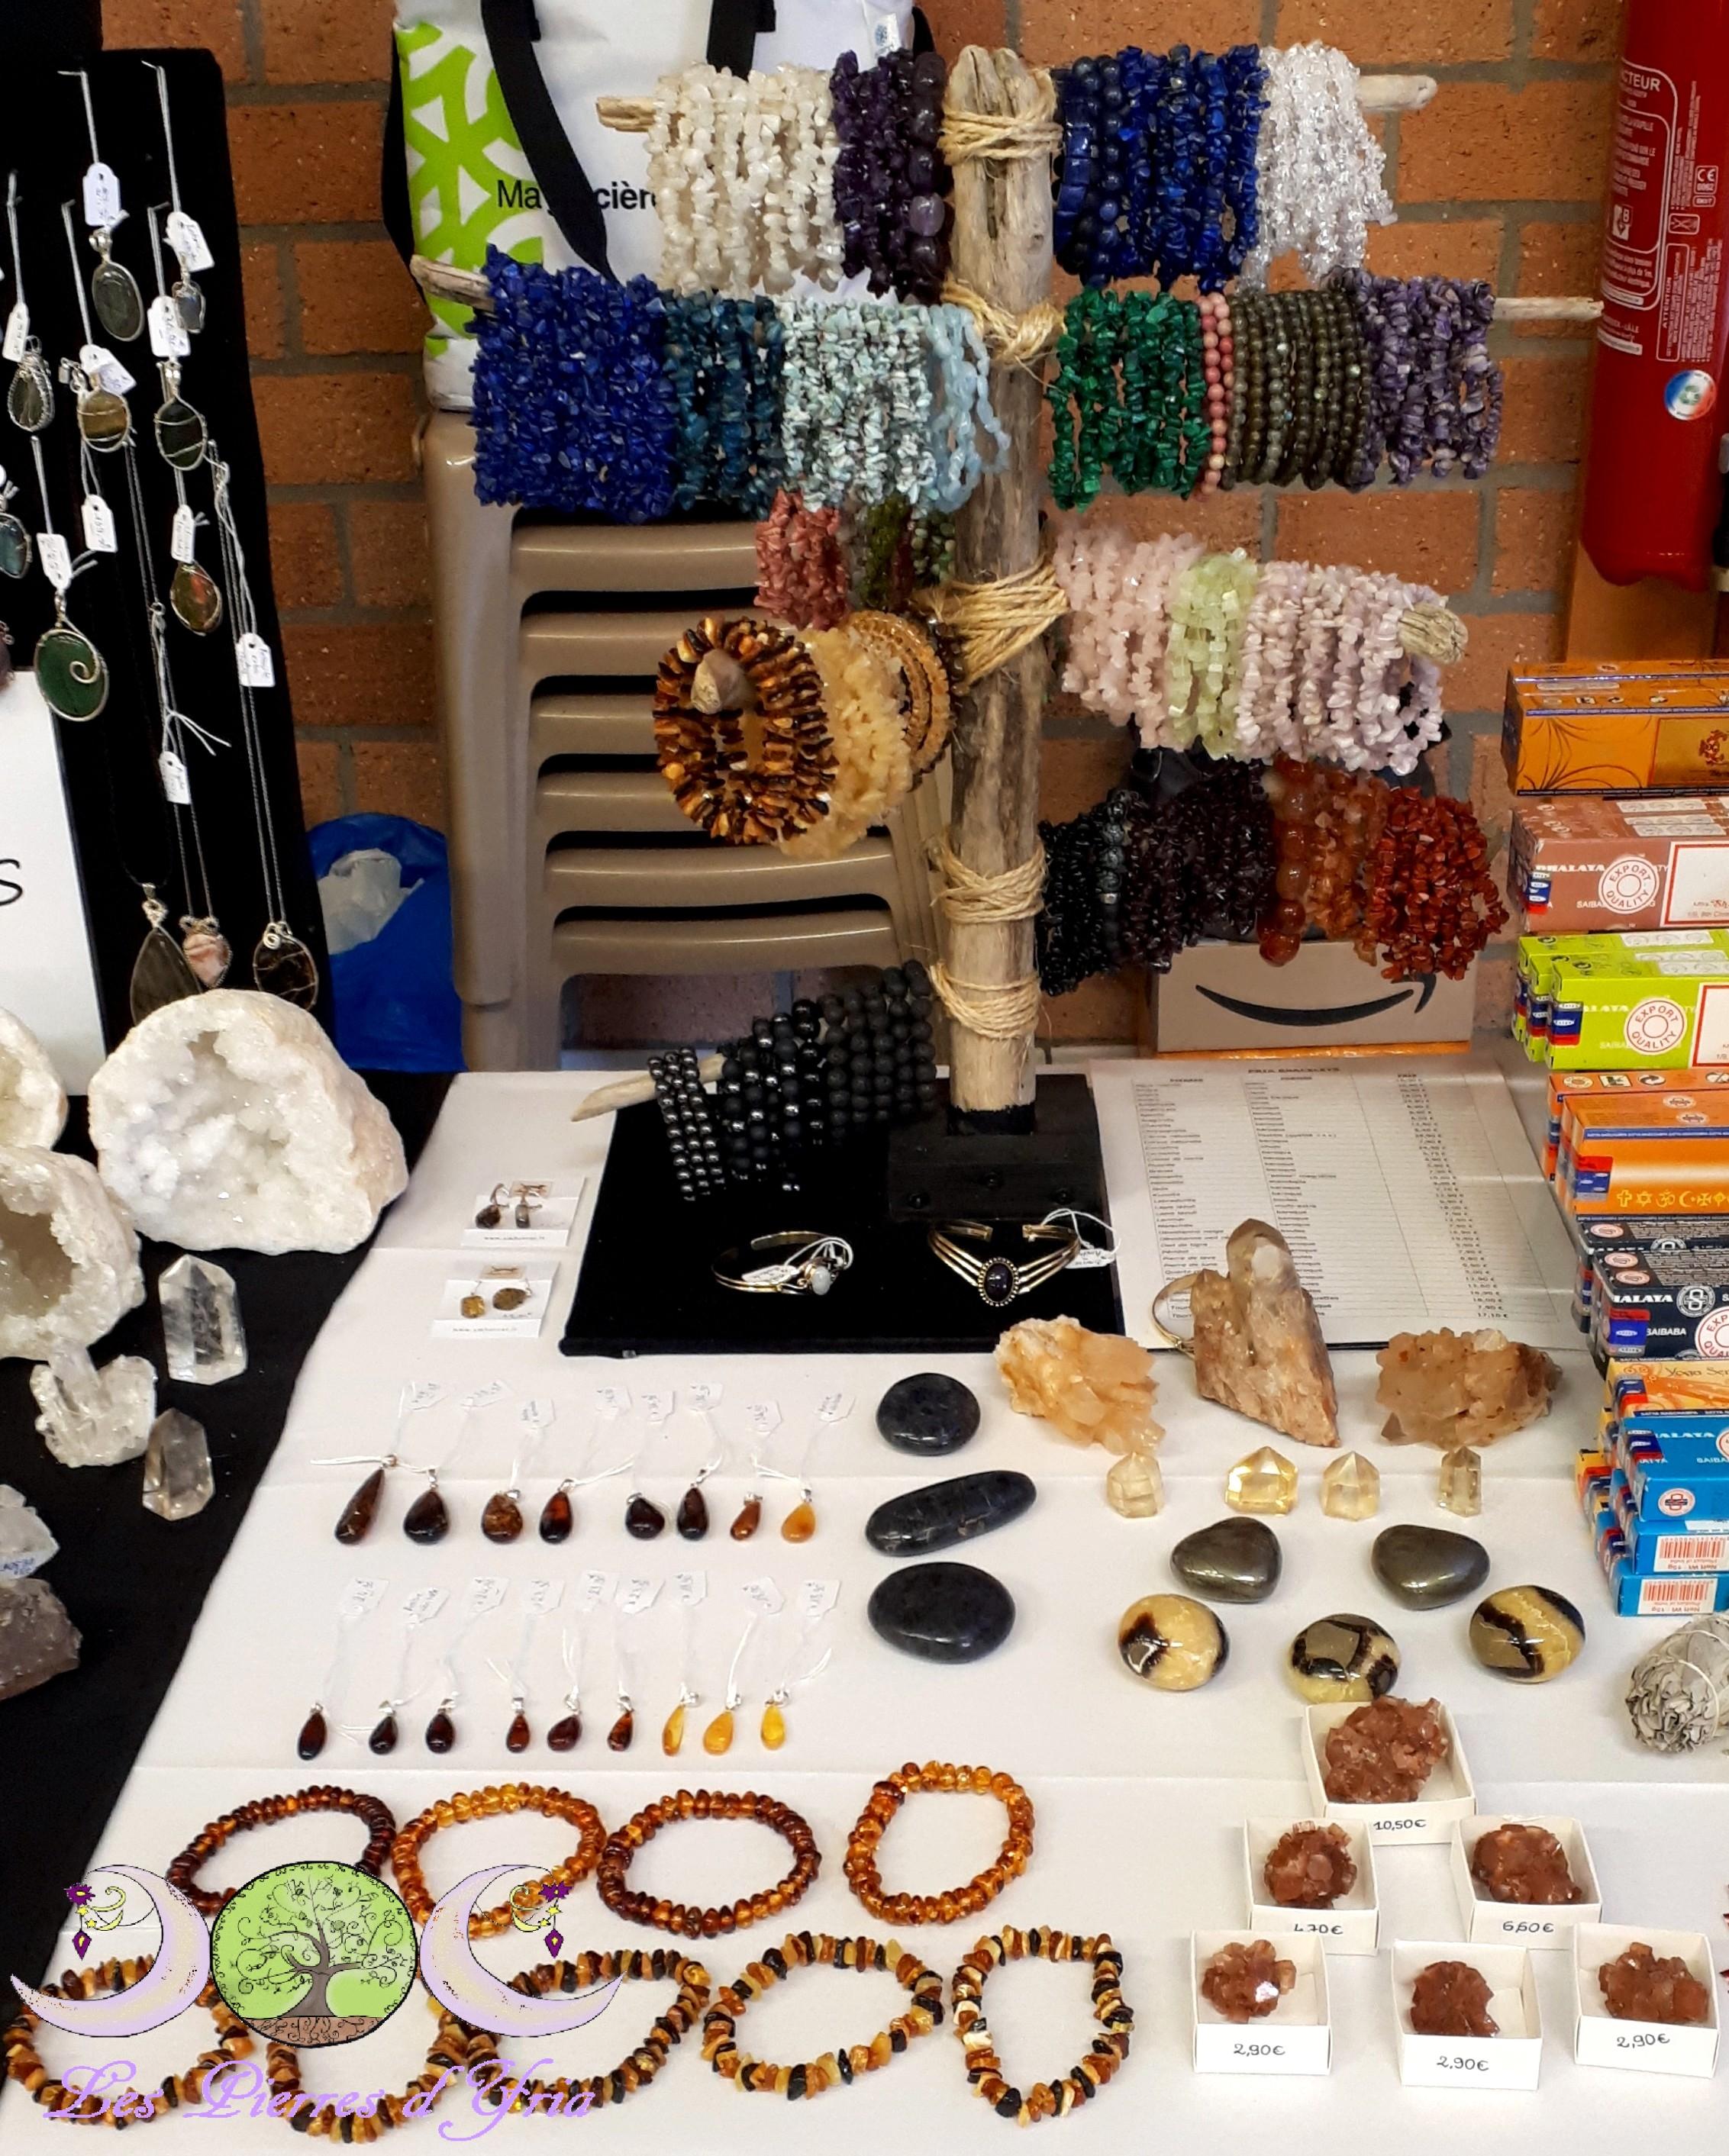 bracelets, ambre, citrine, septaria, pyrite